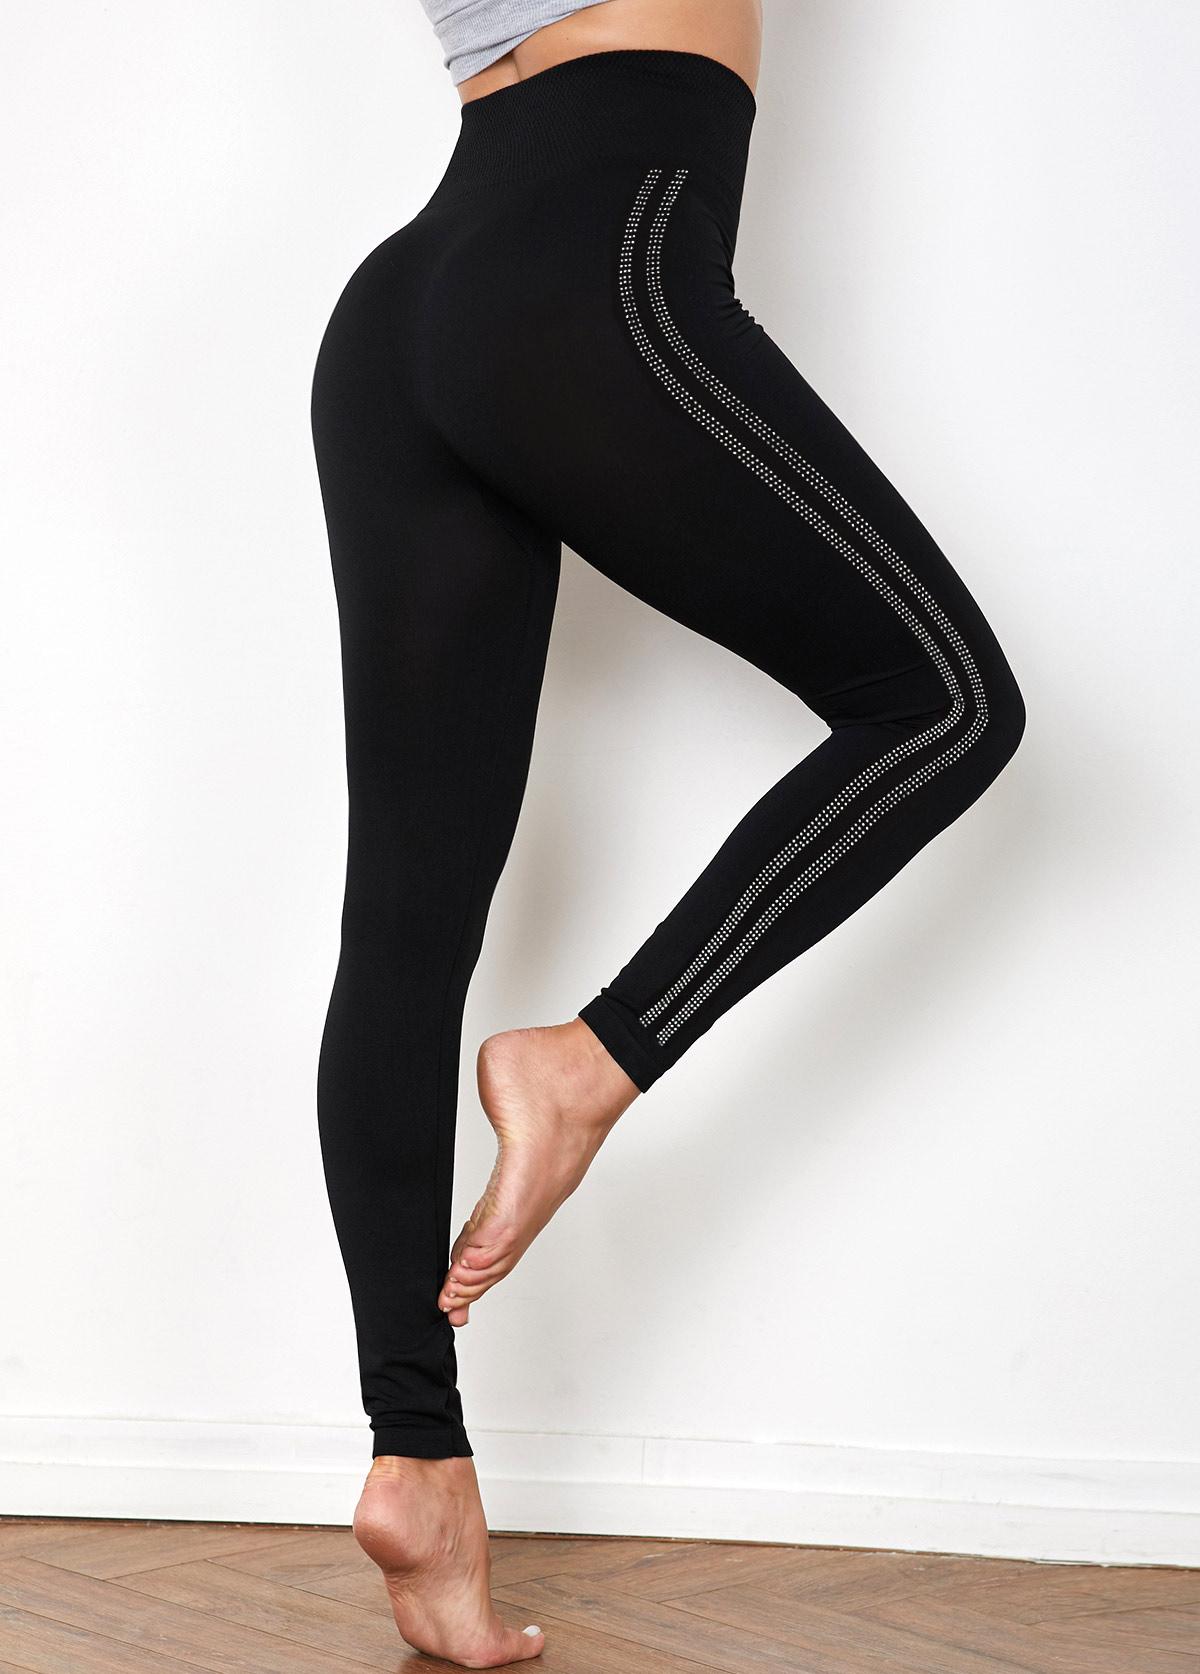 Super Elastic High Waist Hot Drilling Legging Pants